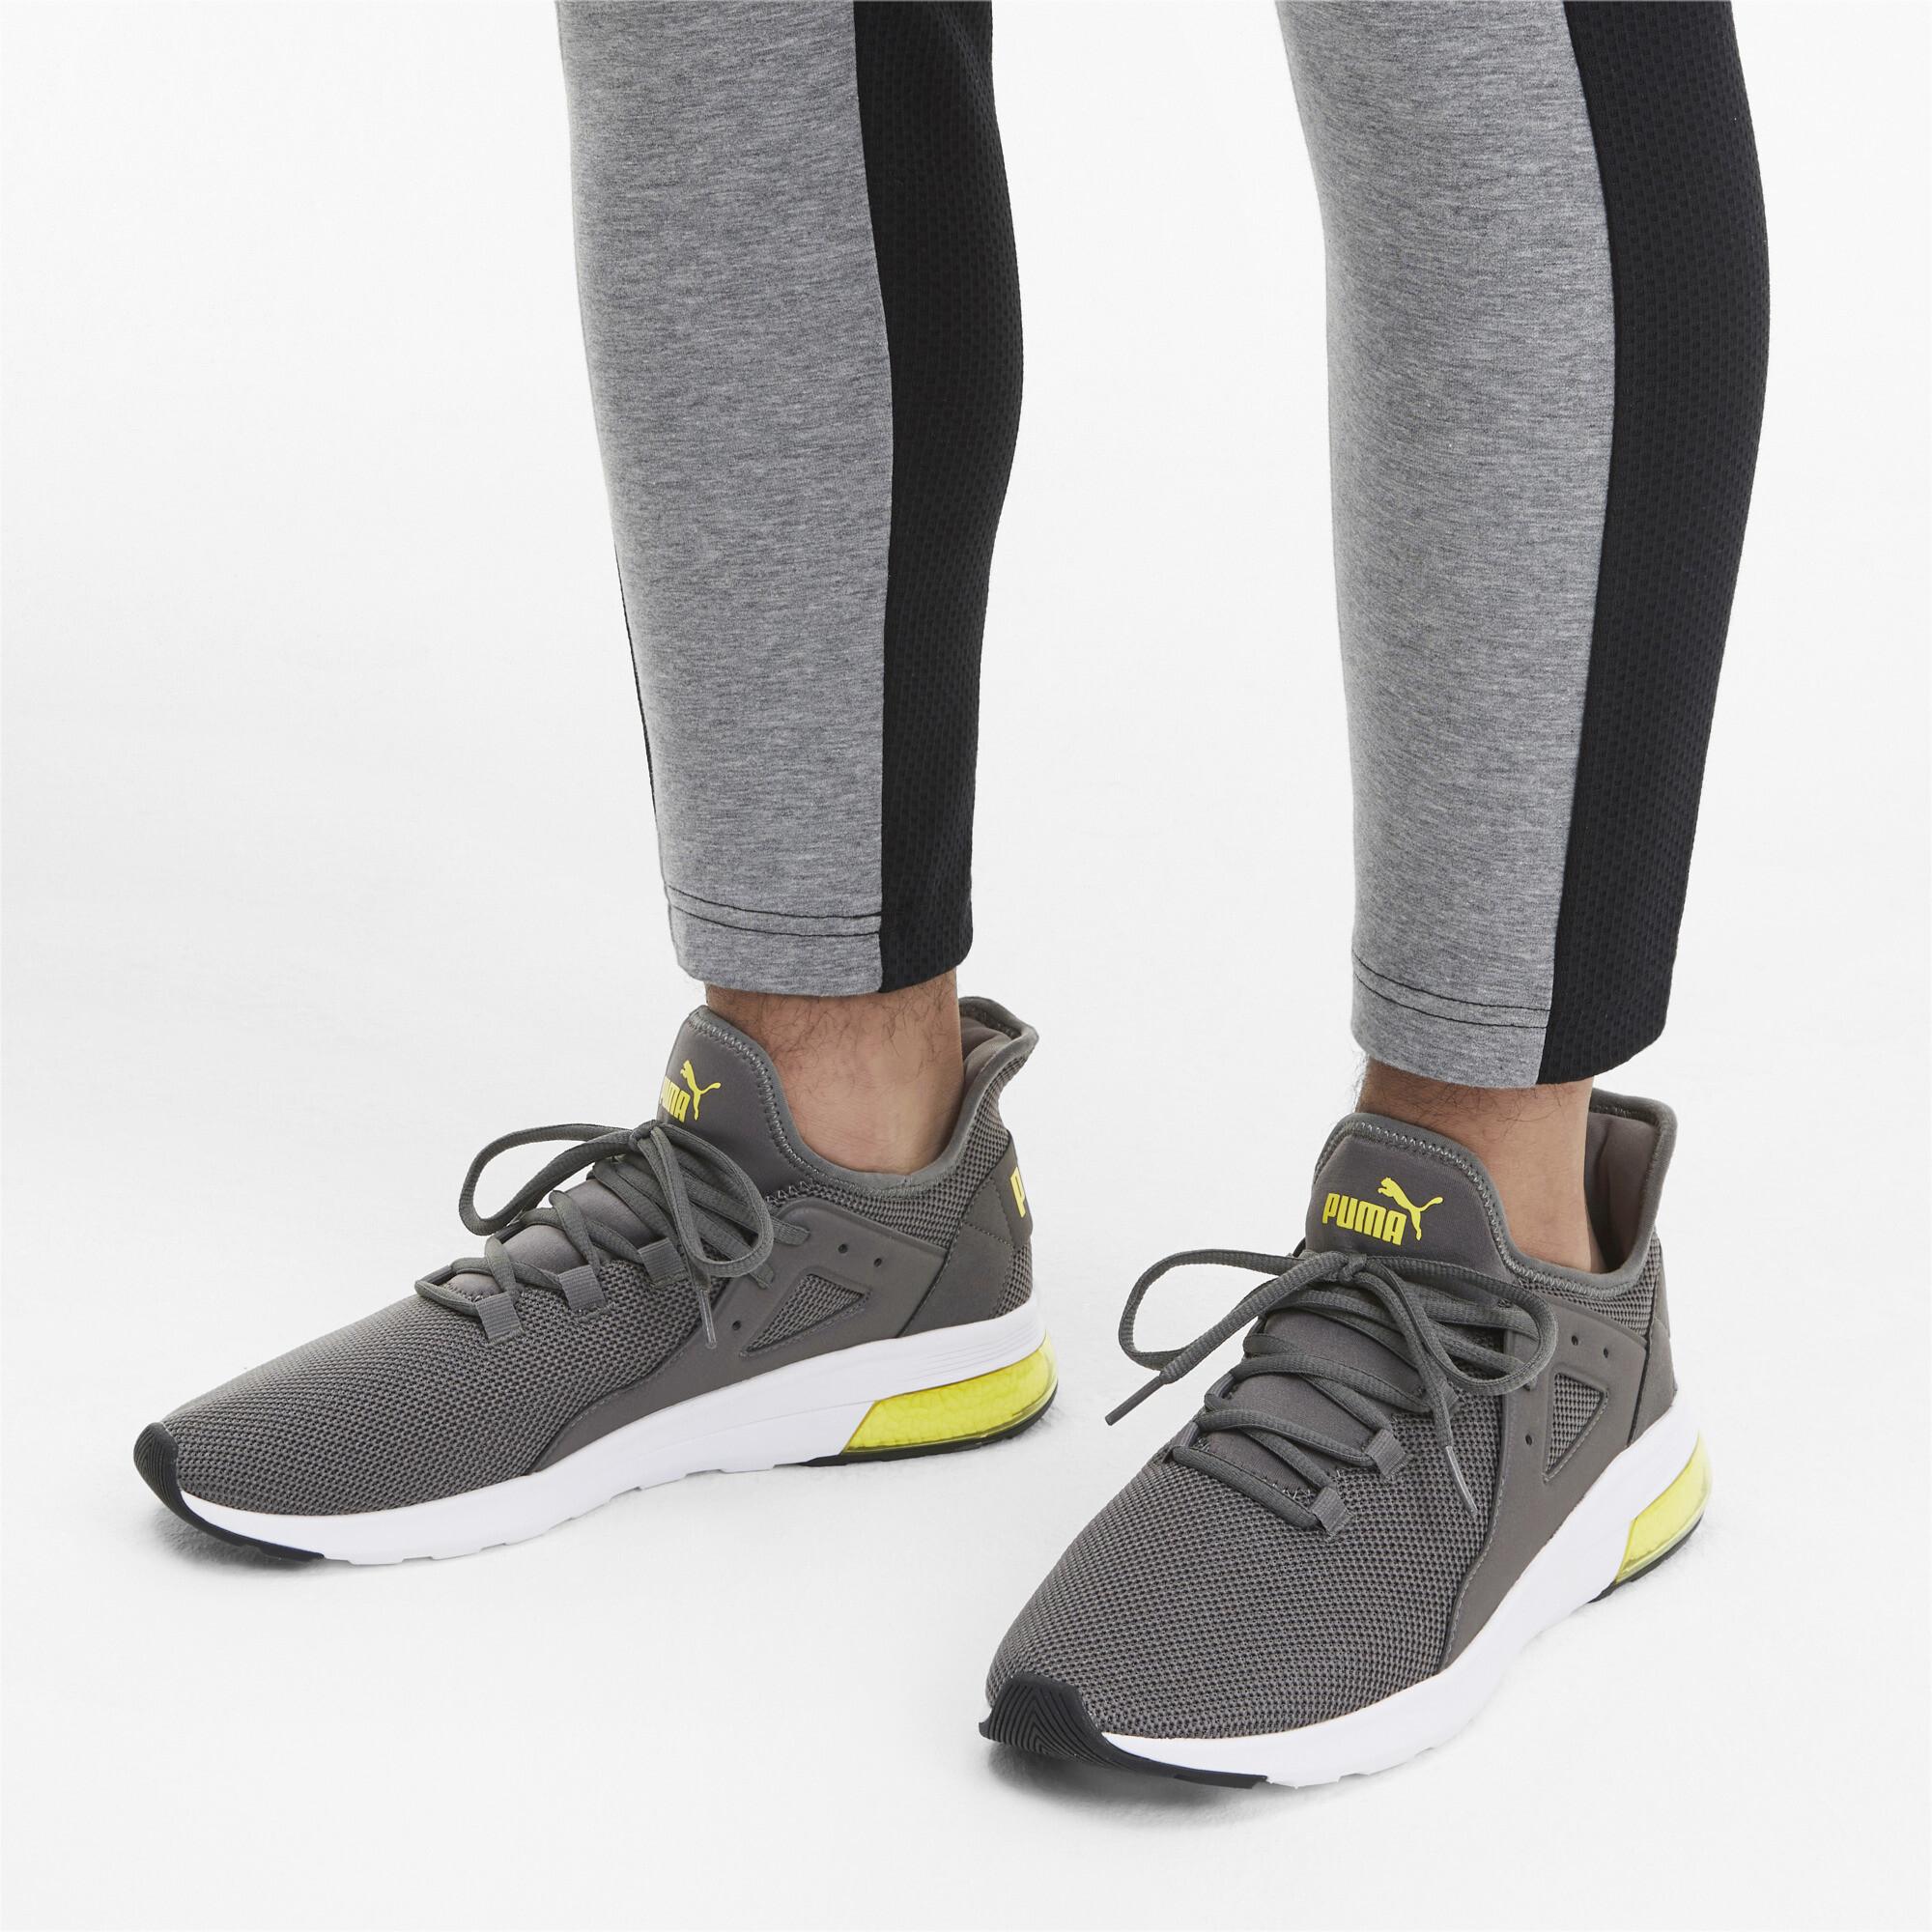 PUMA-Electron-Street-Men-039-s-Sneakers-Men-Shoe-Basics thumbnail 24